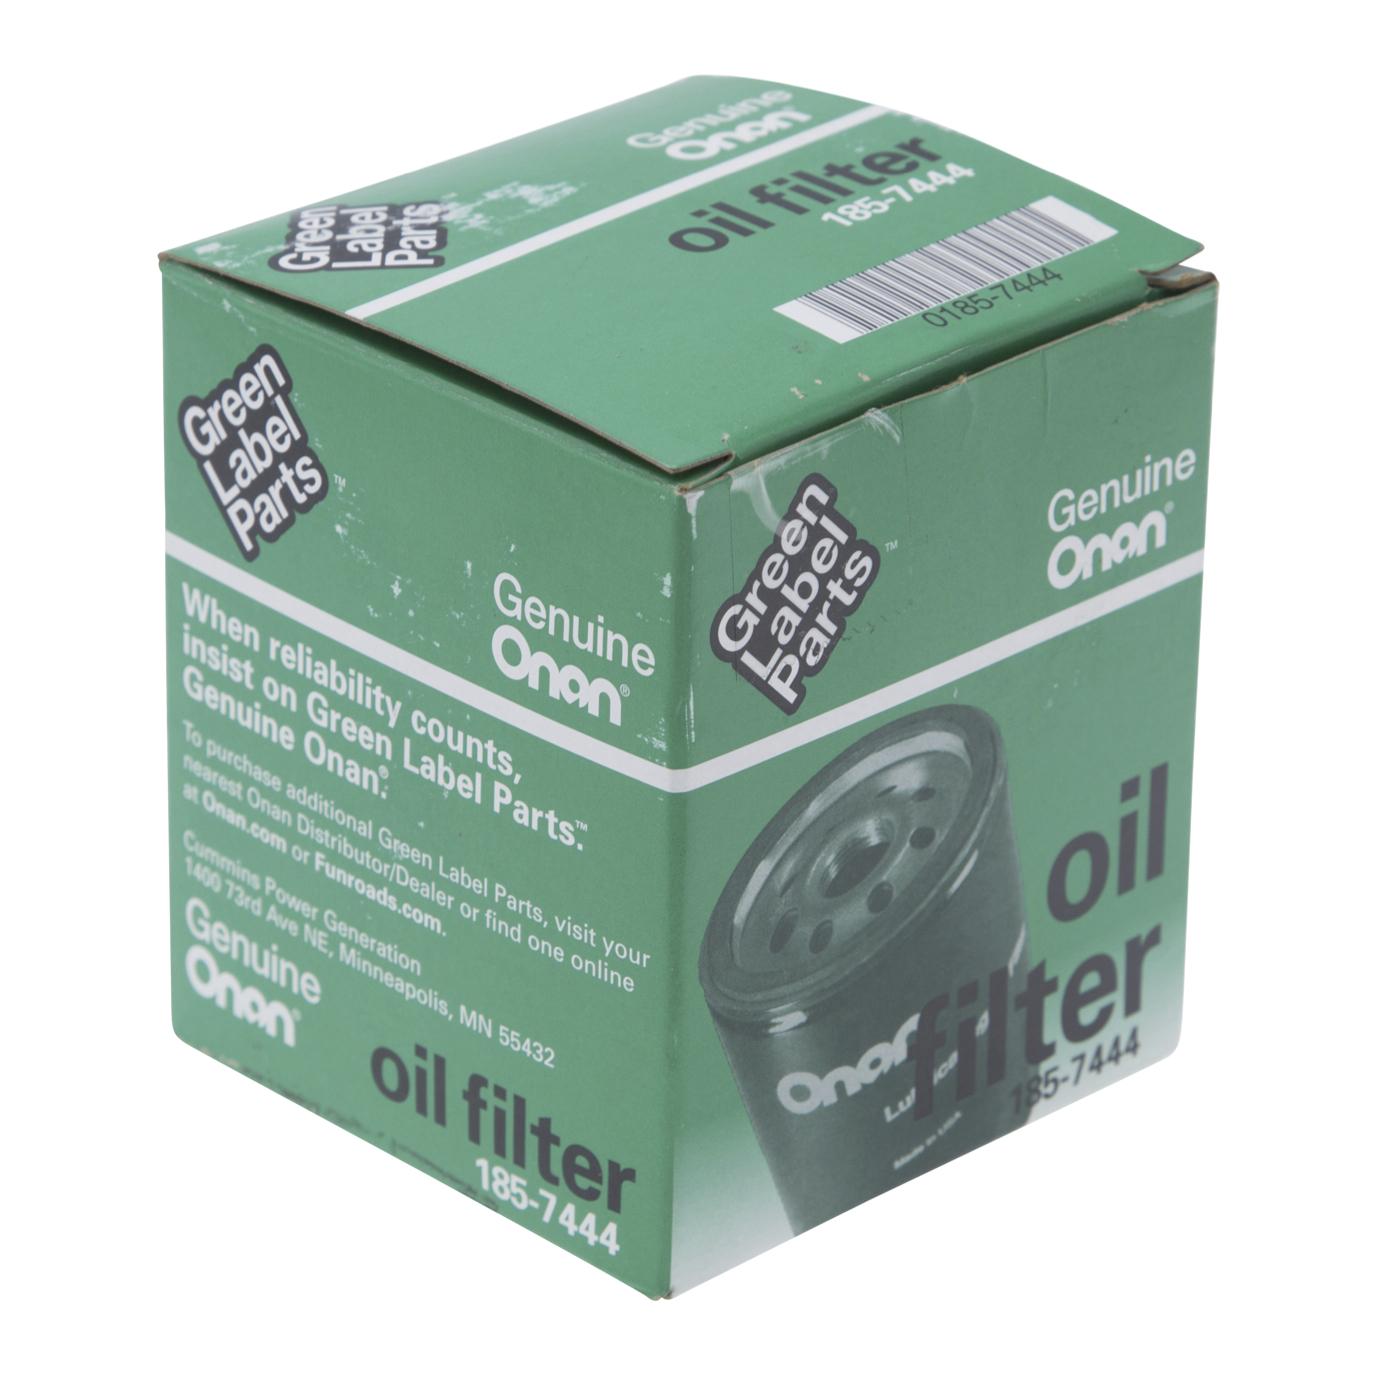 Onan 5kVA Diesel Oil Filter - Genuine manufacturers part